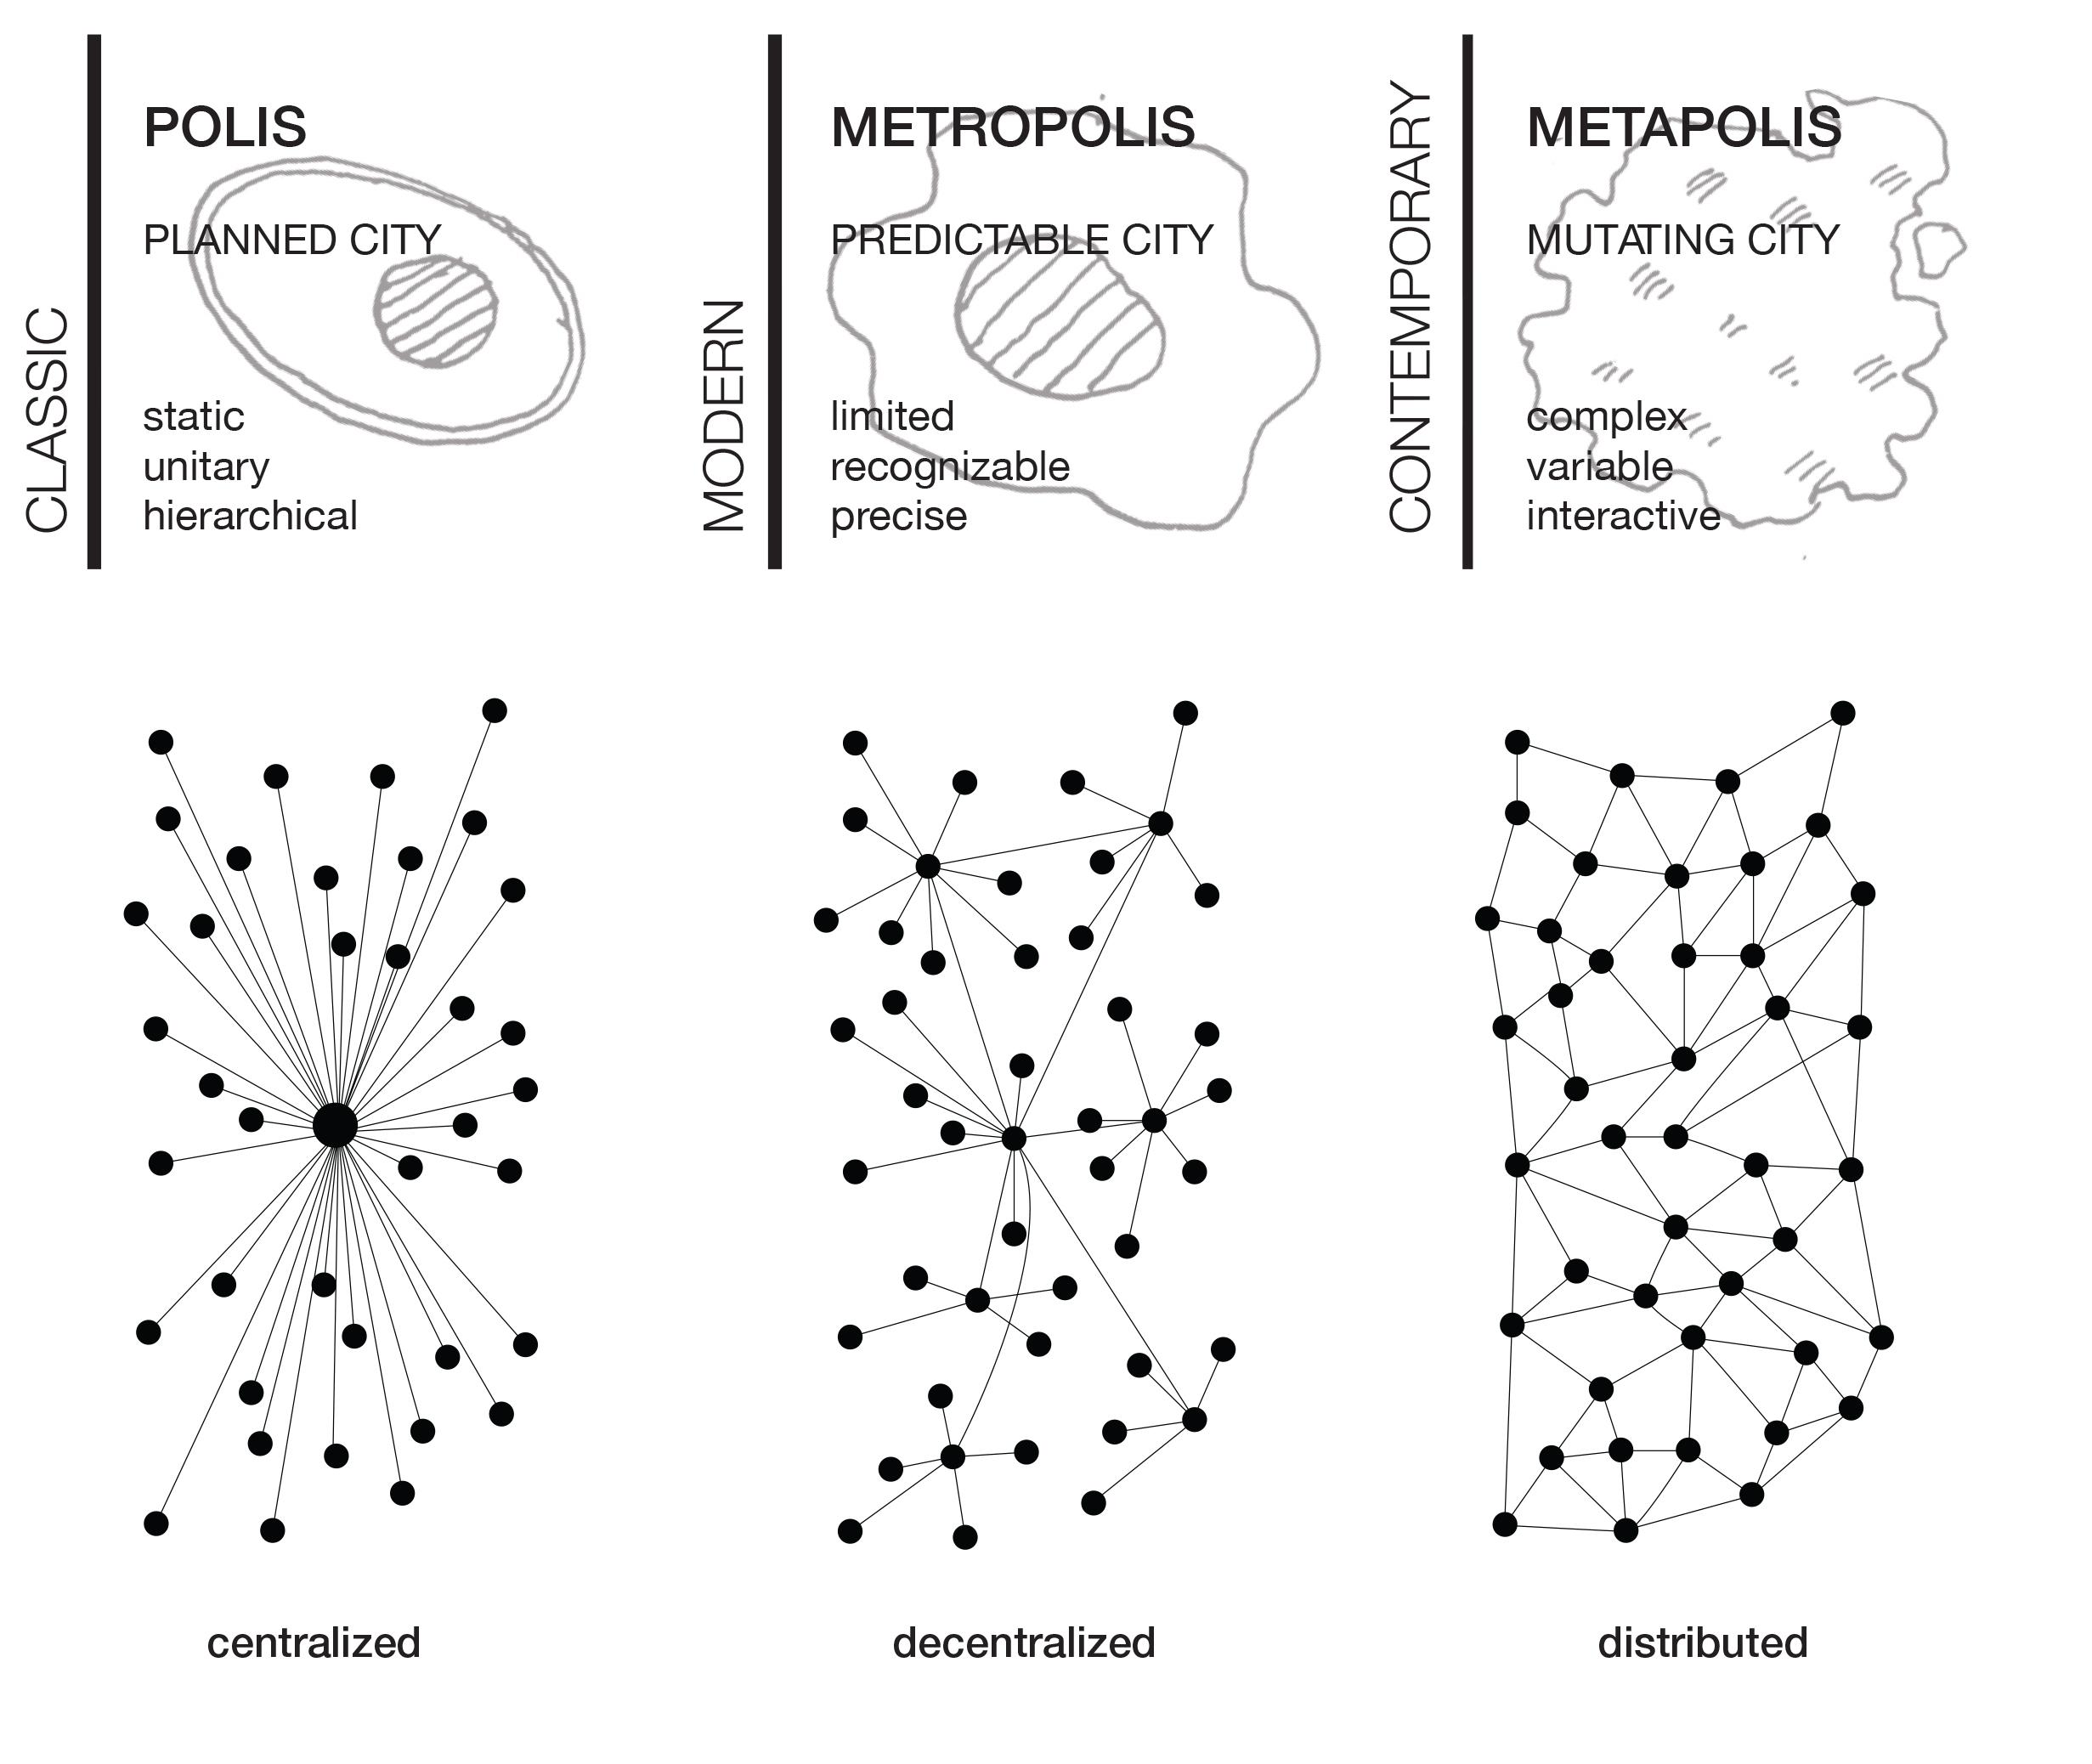 Types of City Metabolism_Cedric Price, Manuel Gausa, Paul Baran